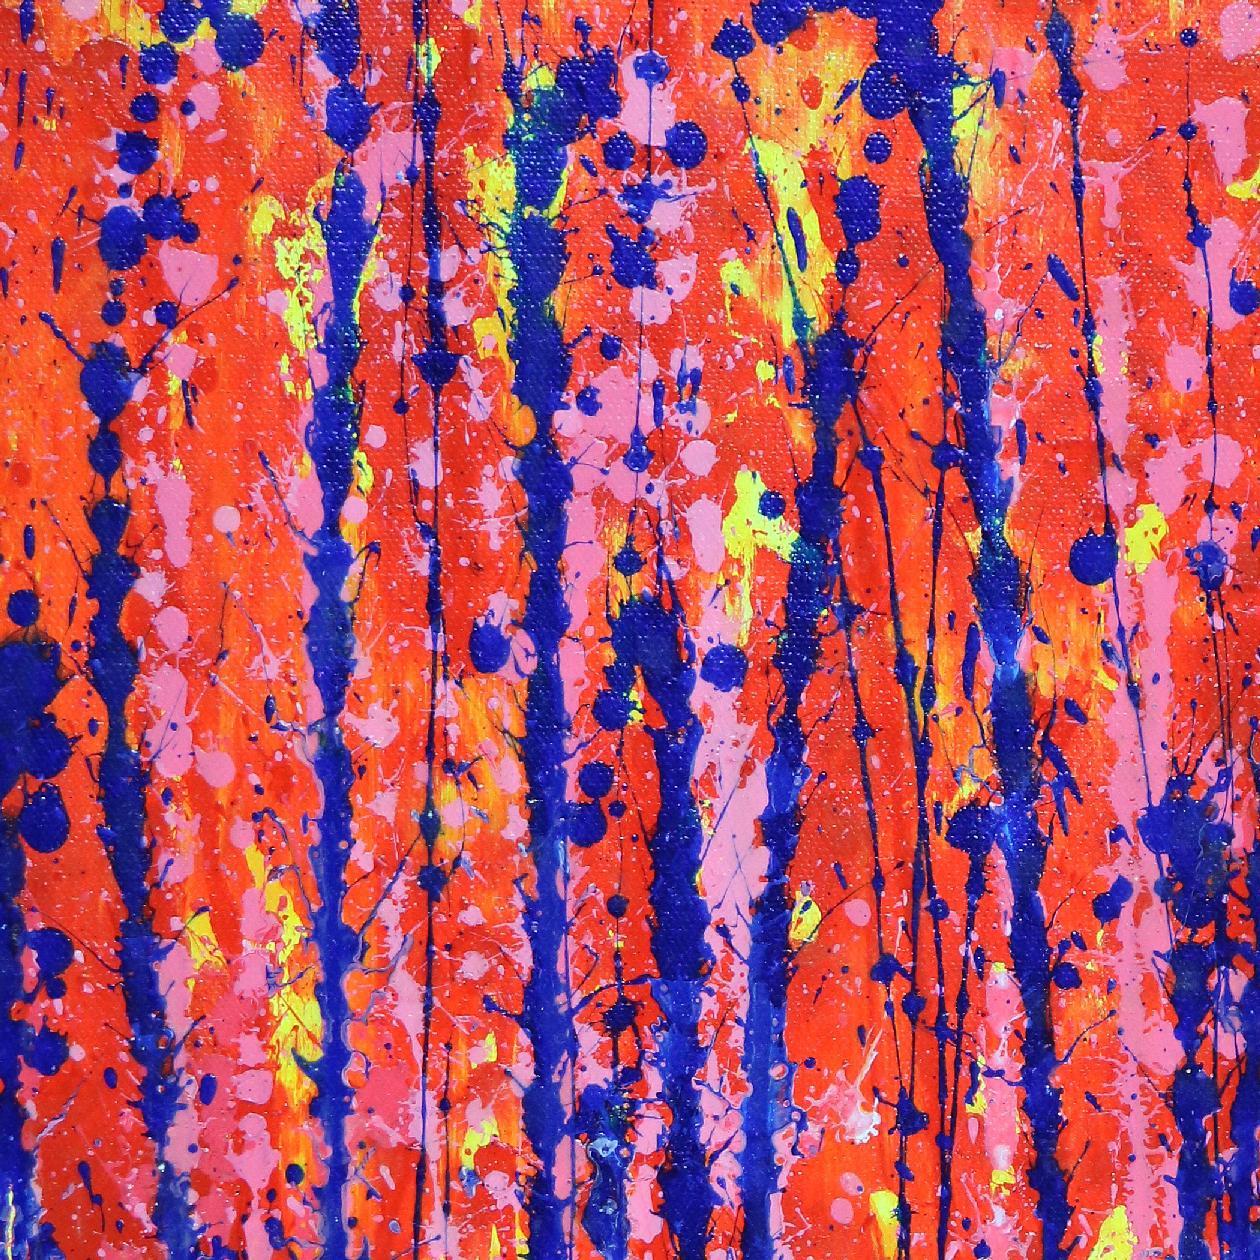 Detail - Daring Spectra #3 (2020) by Nestor Toro